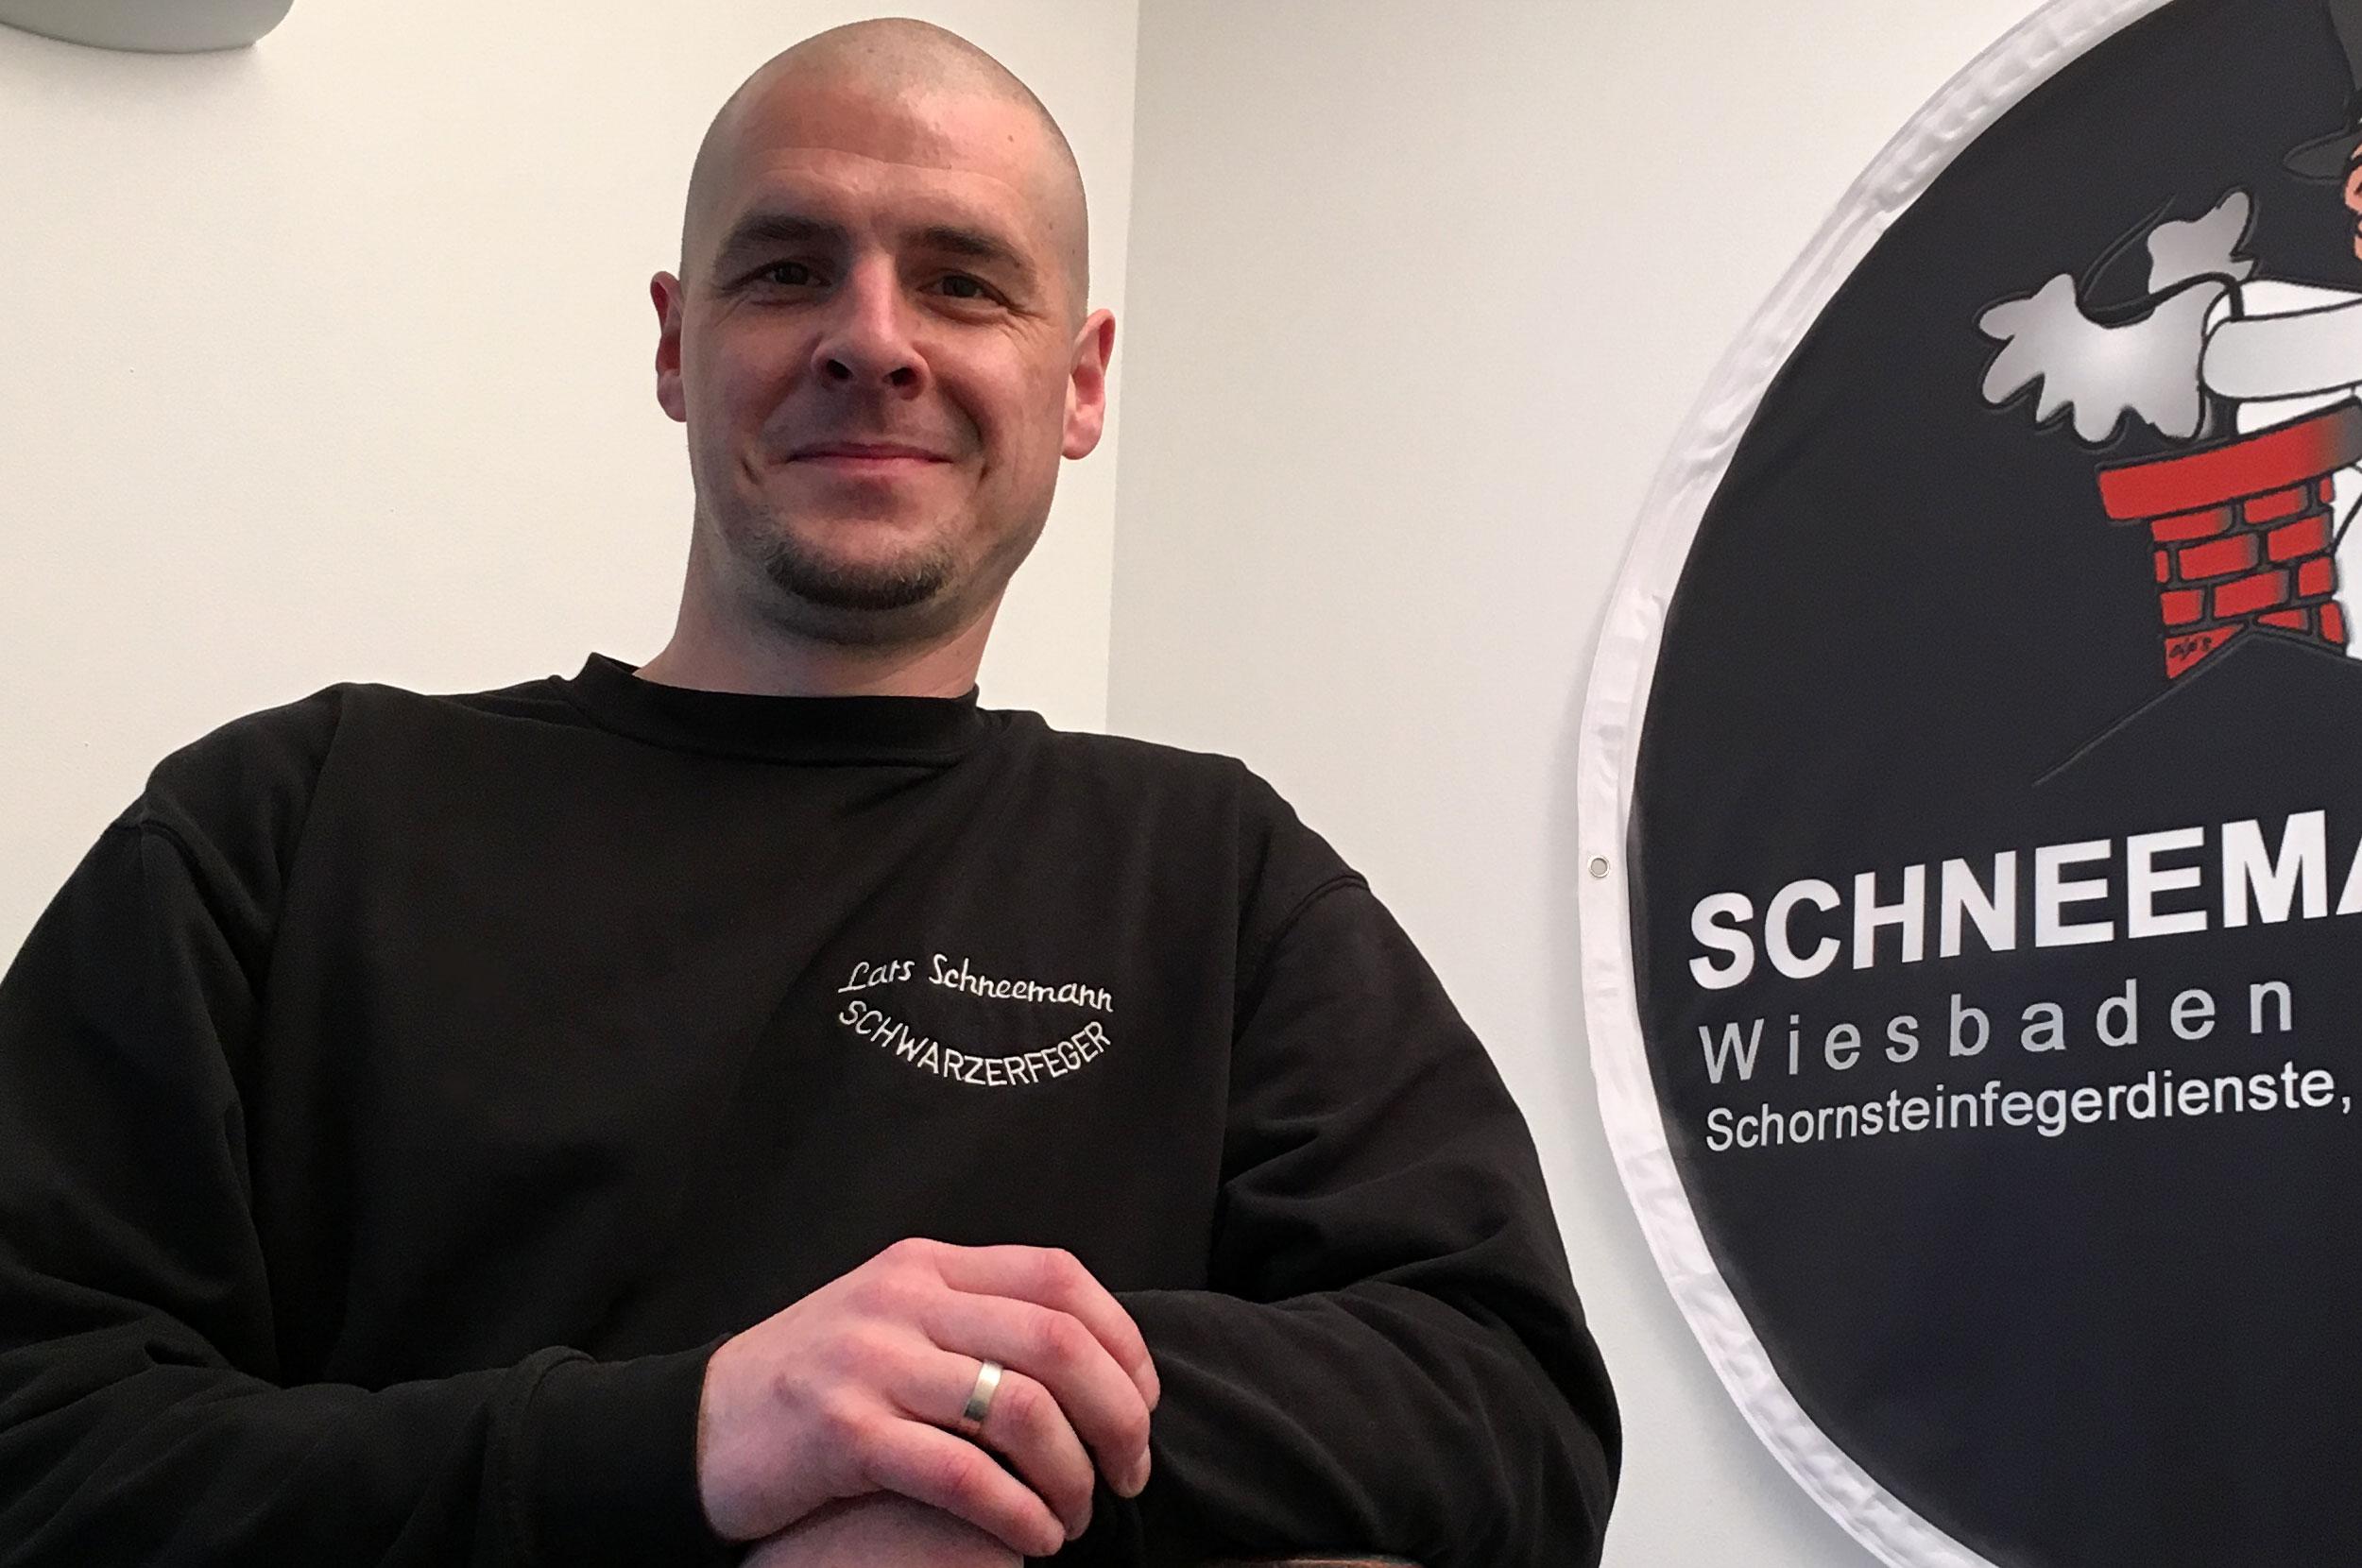 http://schwarzerfeger.de/wp-content/uploads/2015/12/lars-schneemann-sfm.jpg